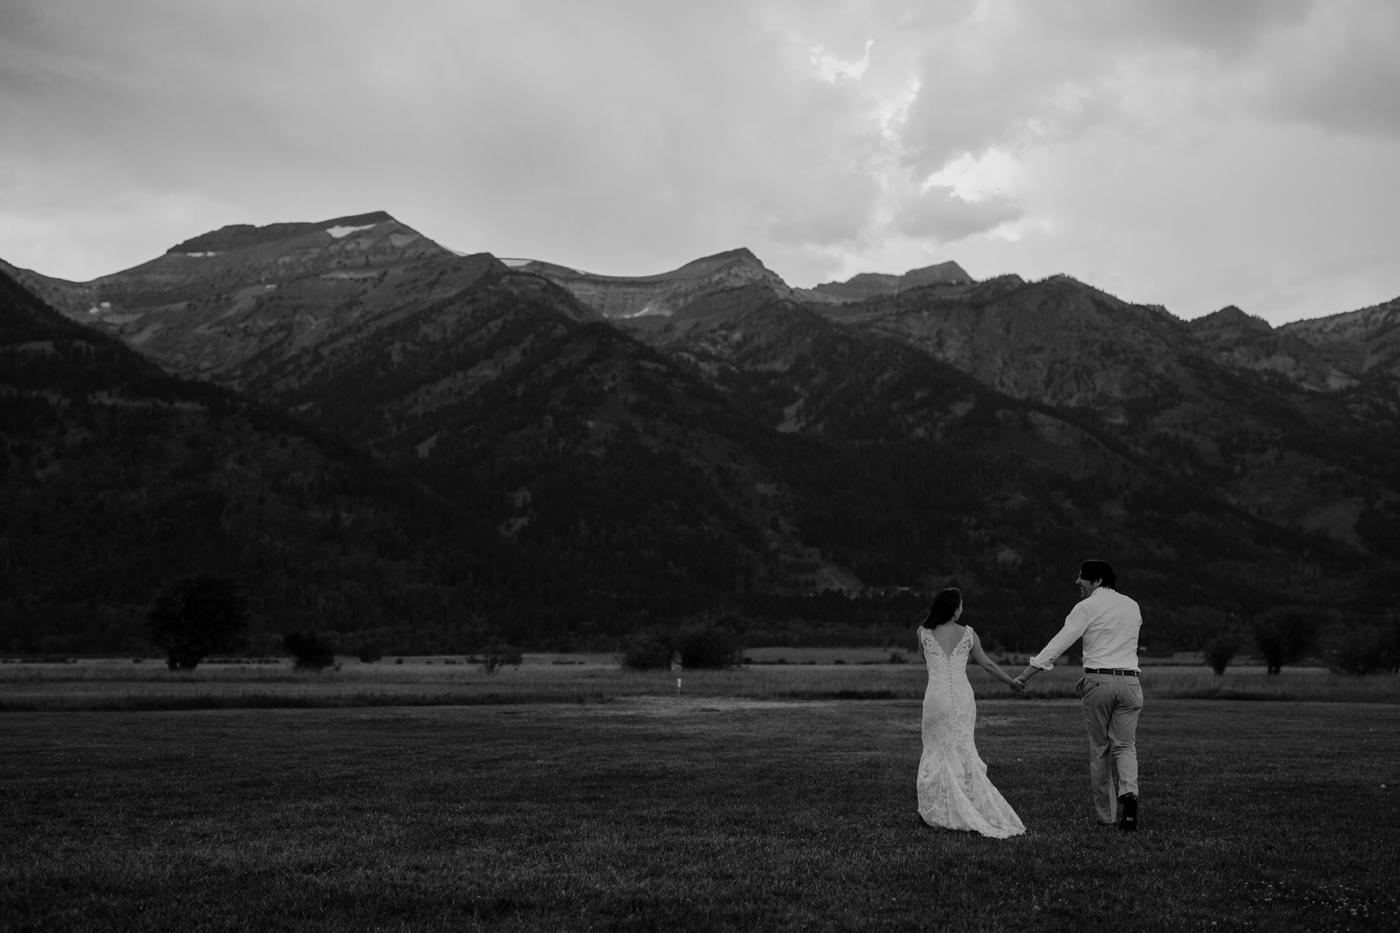 107-grand-teton-jackson-hole-wyoming-wedding.jpg